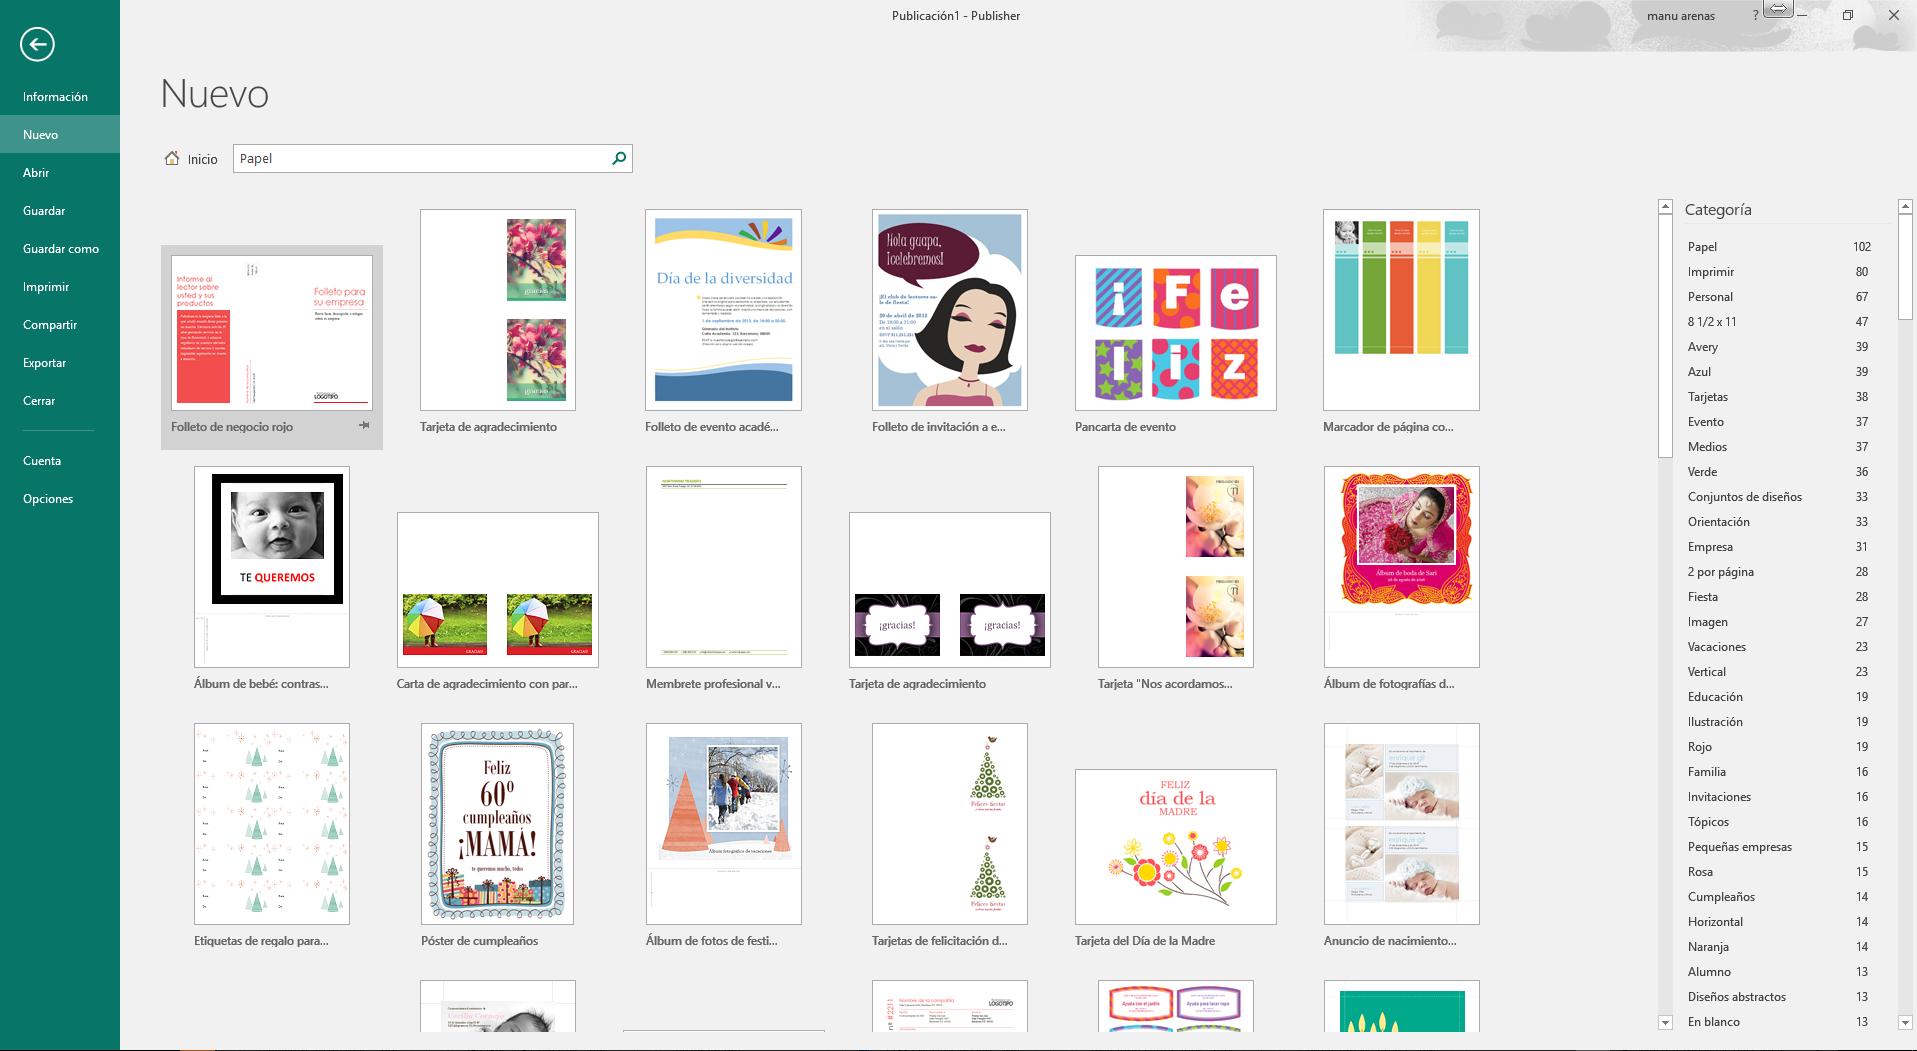 transformer un pdf en publisher